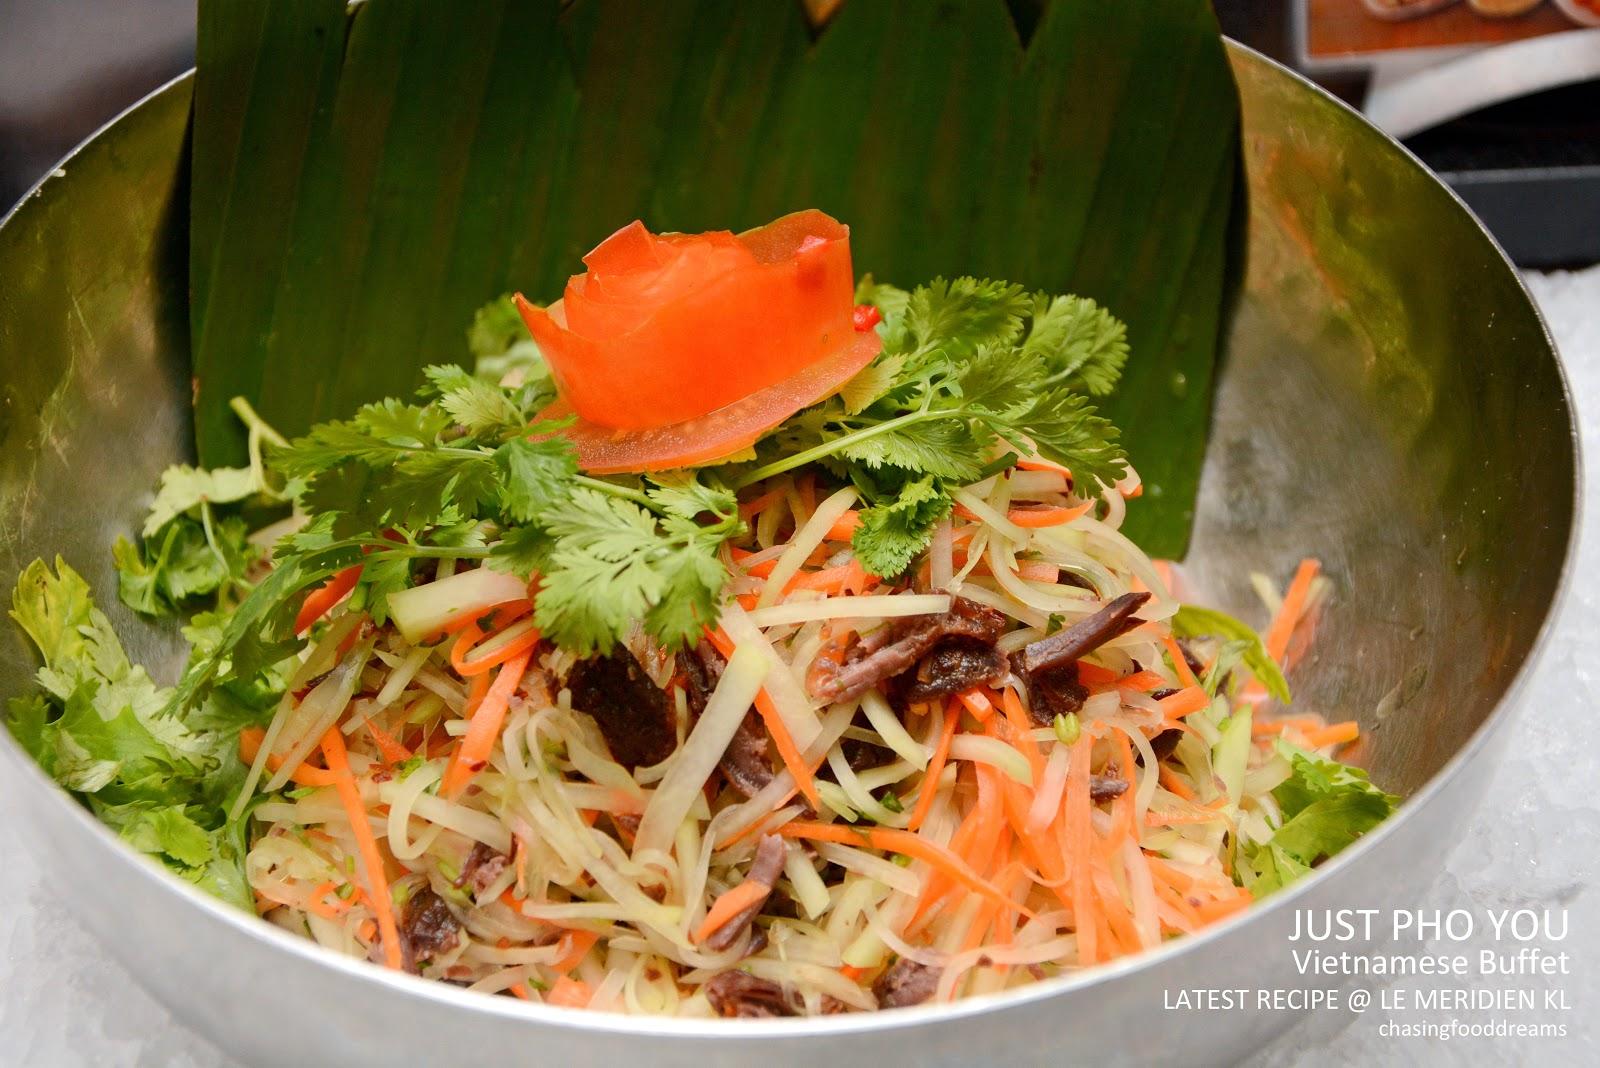 CHASING FOOD DREAMS: Latest Recipe @ Le Meridien Kuala Lumpur